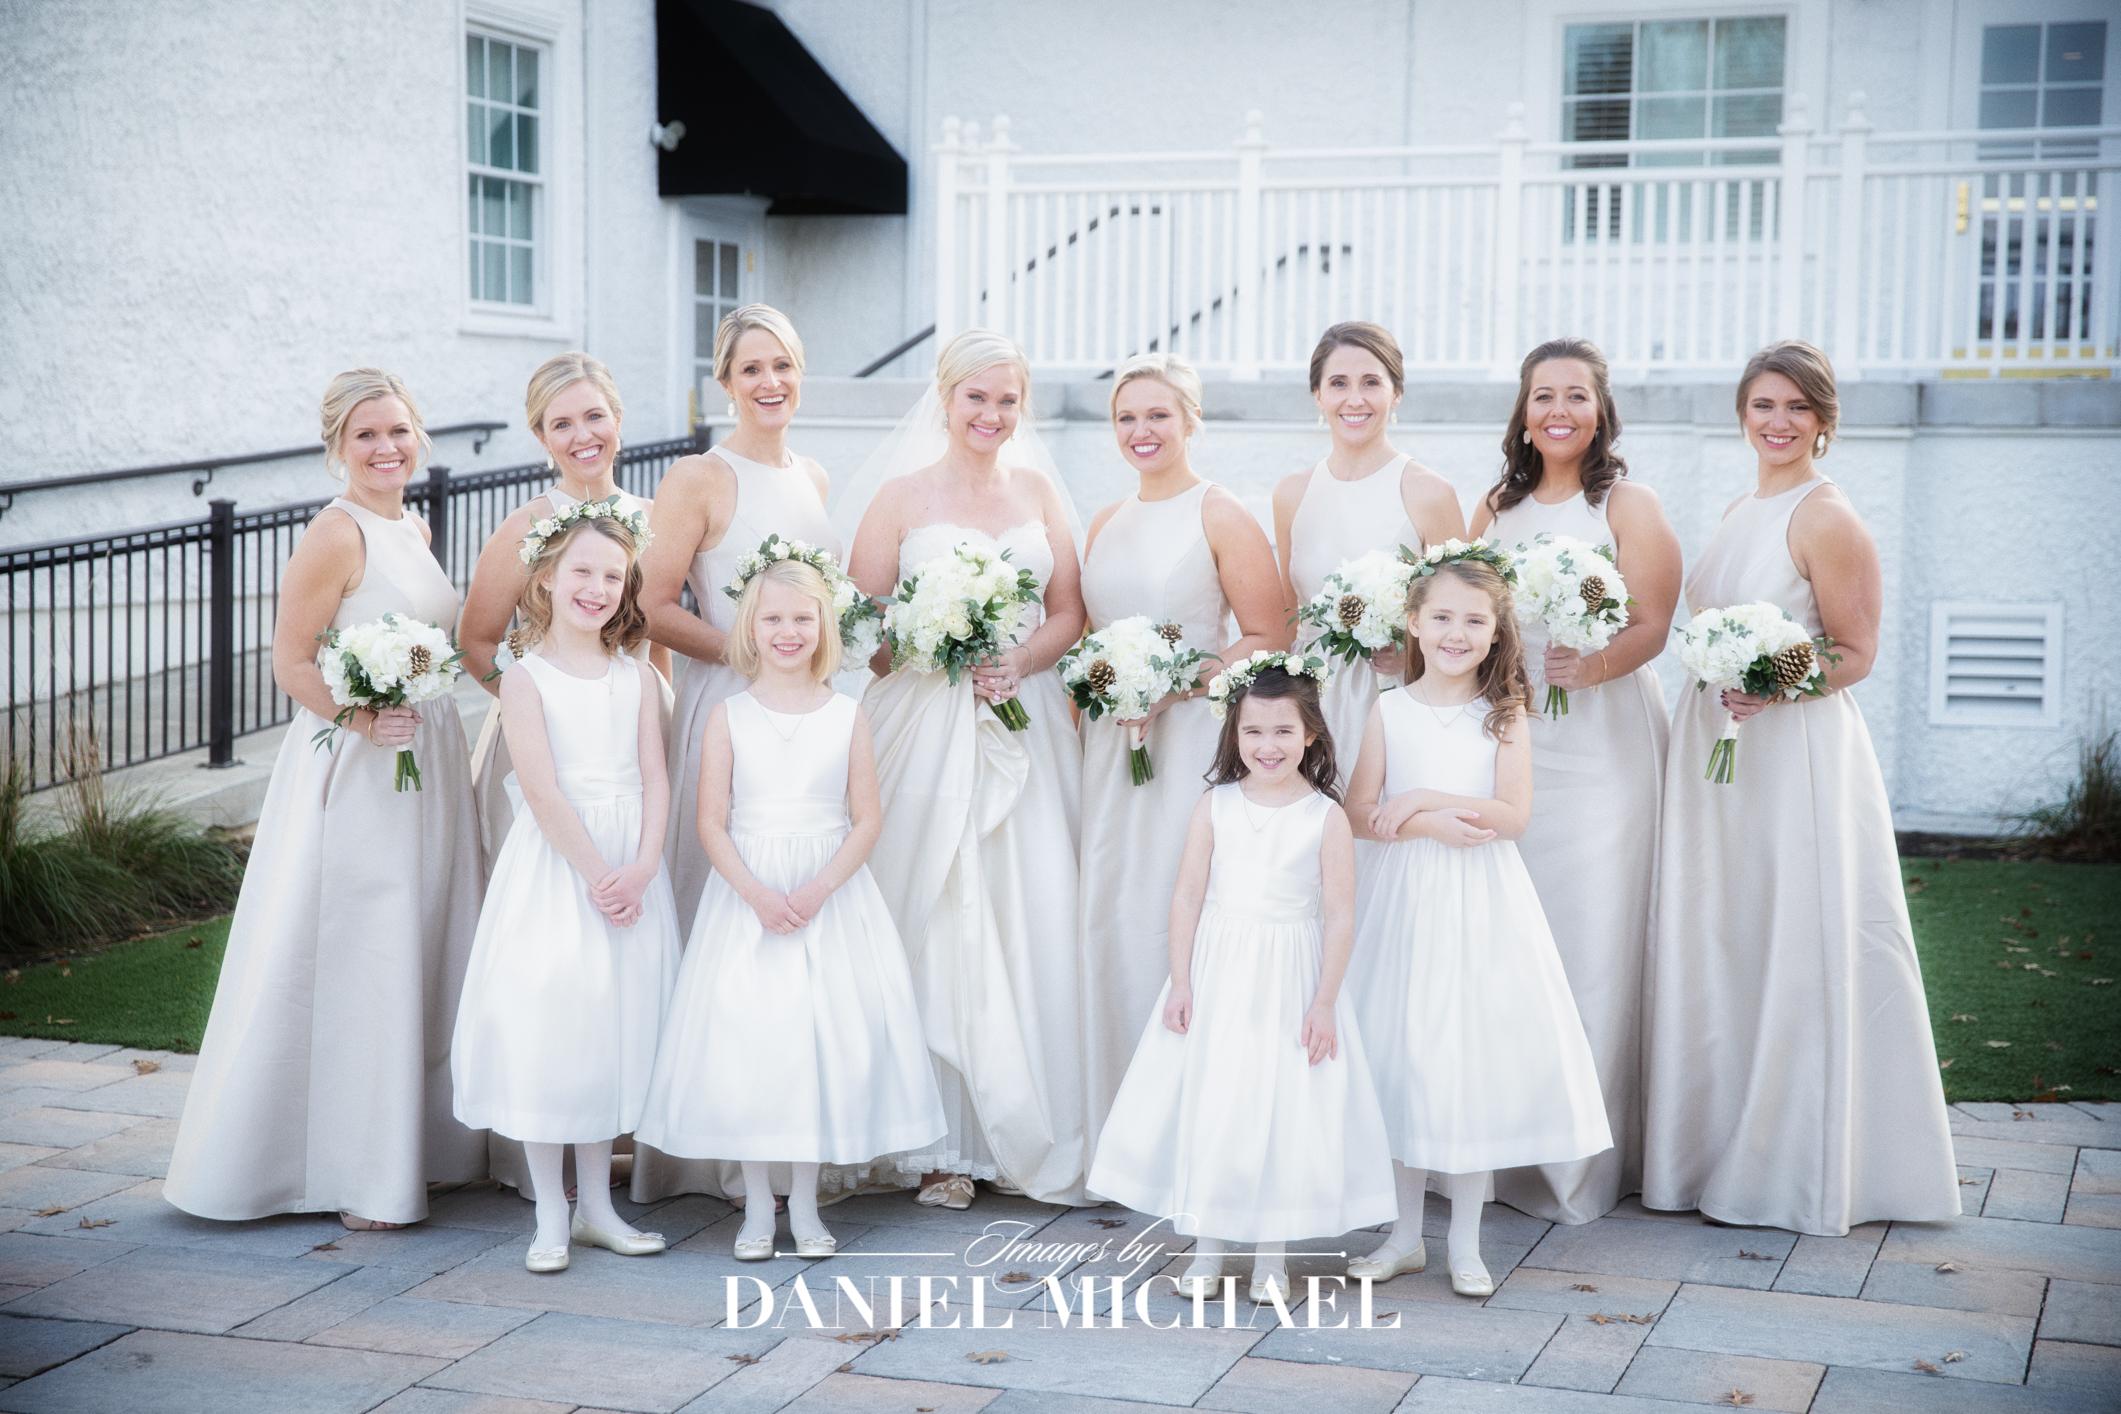 Hyde Park Country Club Wedding Reception Venue Photographer